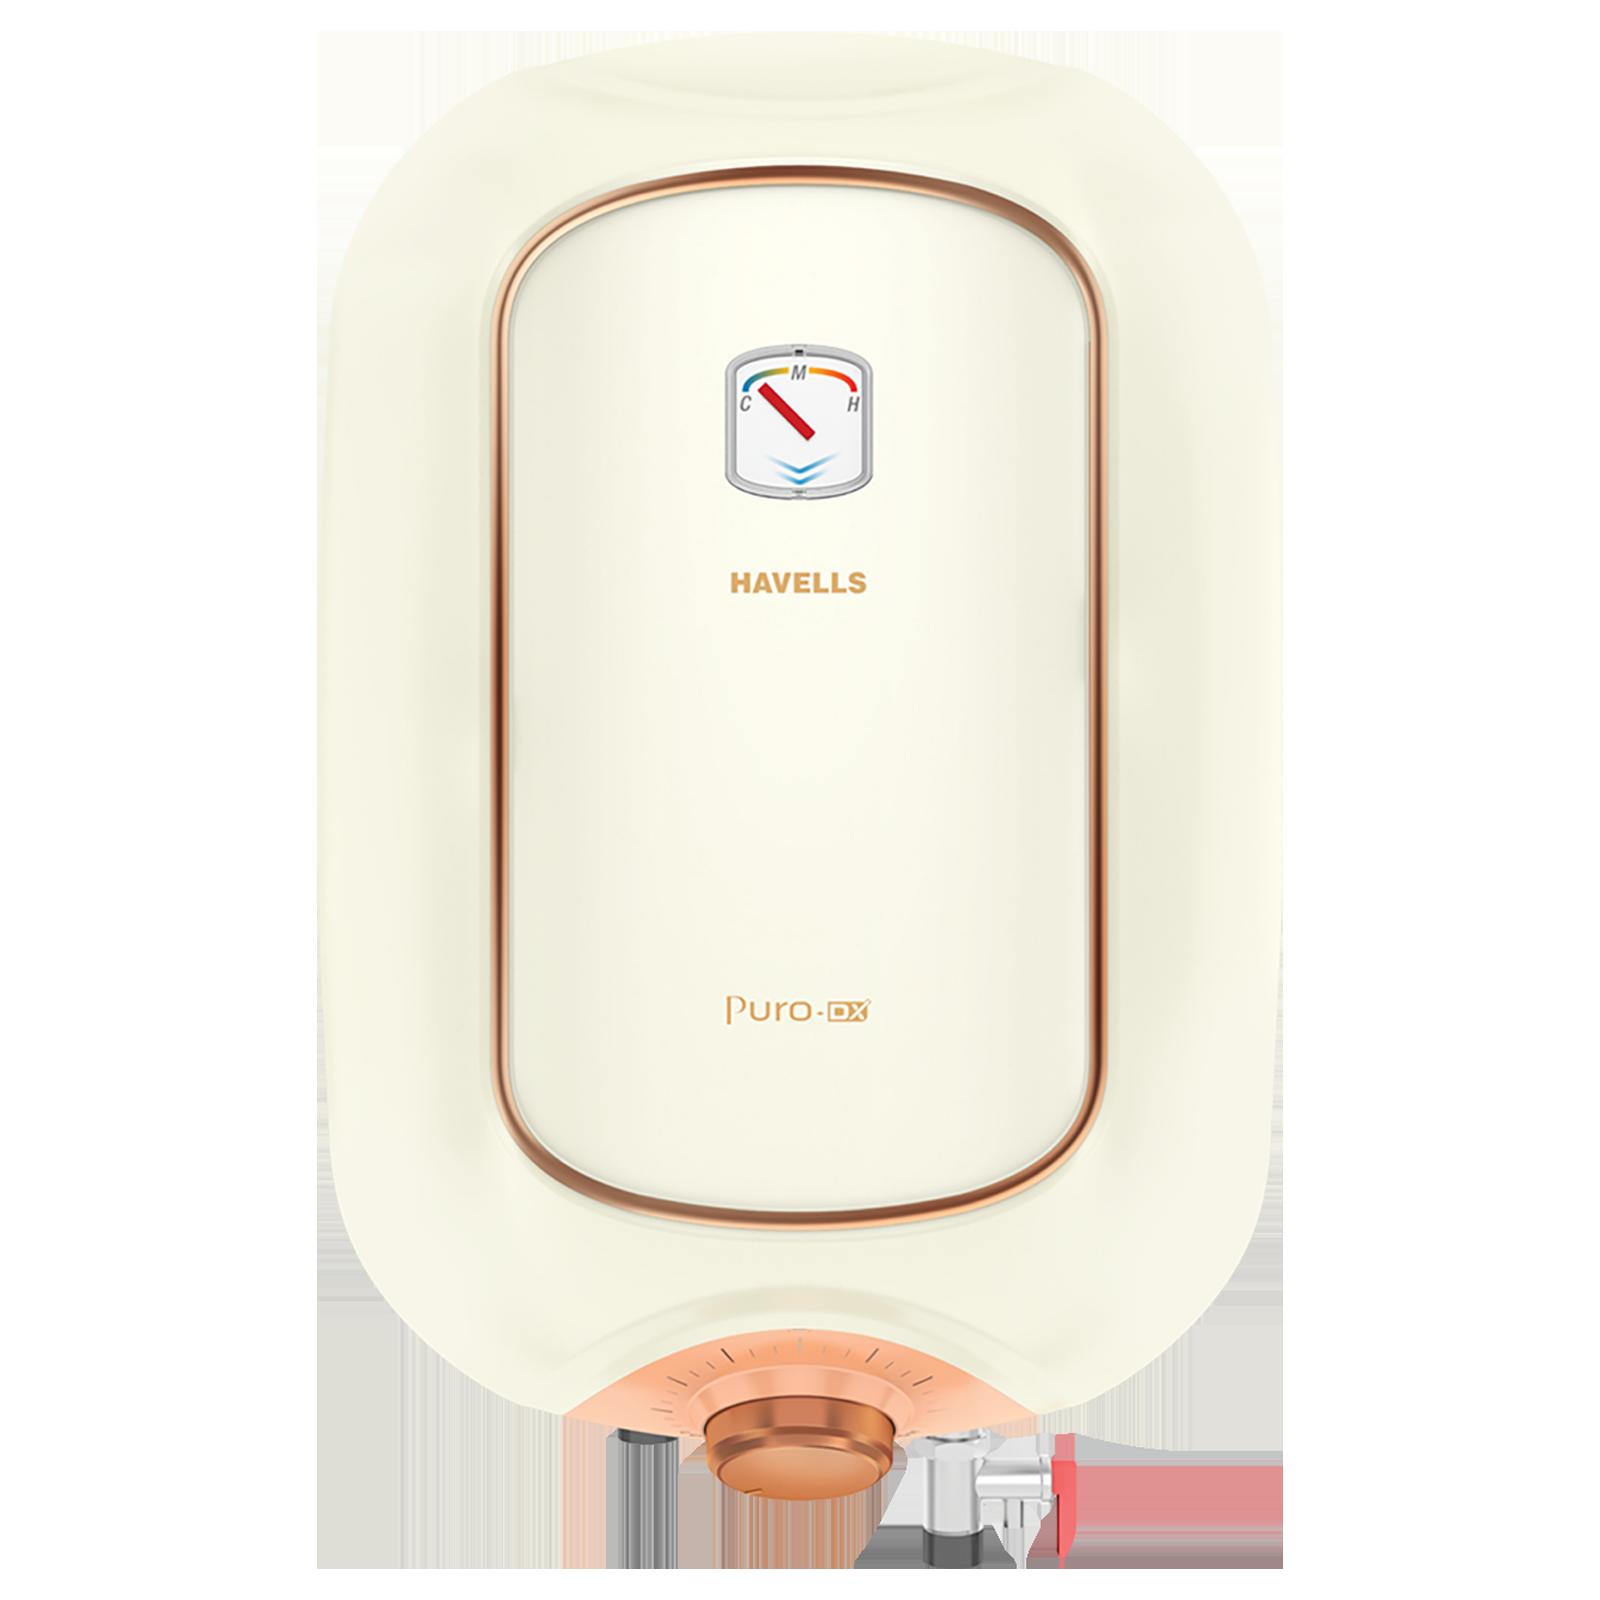 Havells Puro DX 10 Litres Vertical Storage Water Geyser (GHWAPDTIV010, Ivory Pink)_1